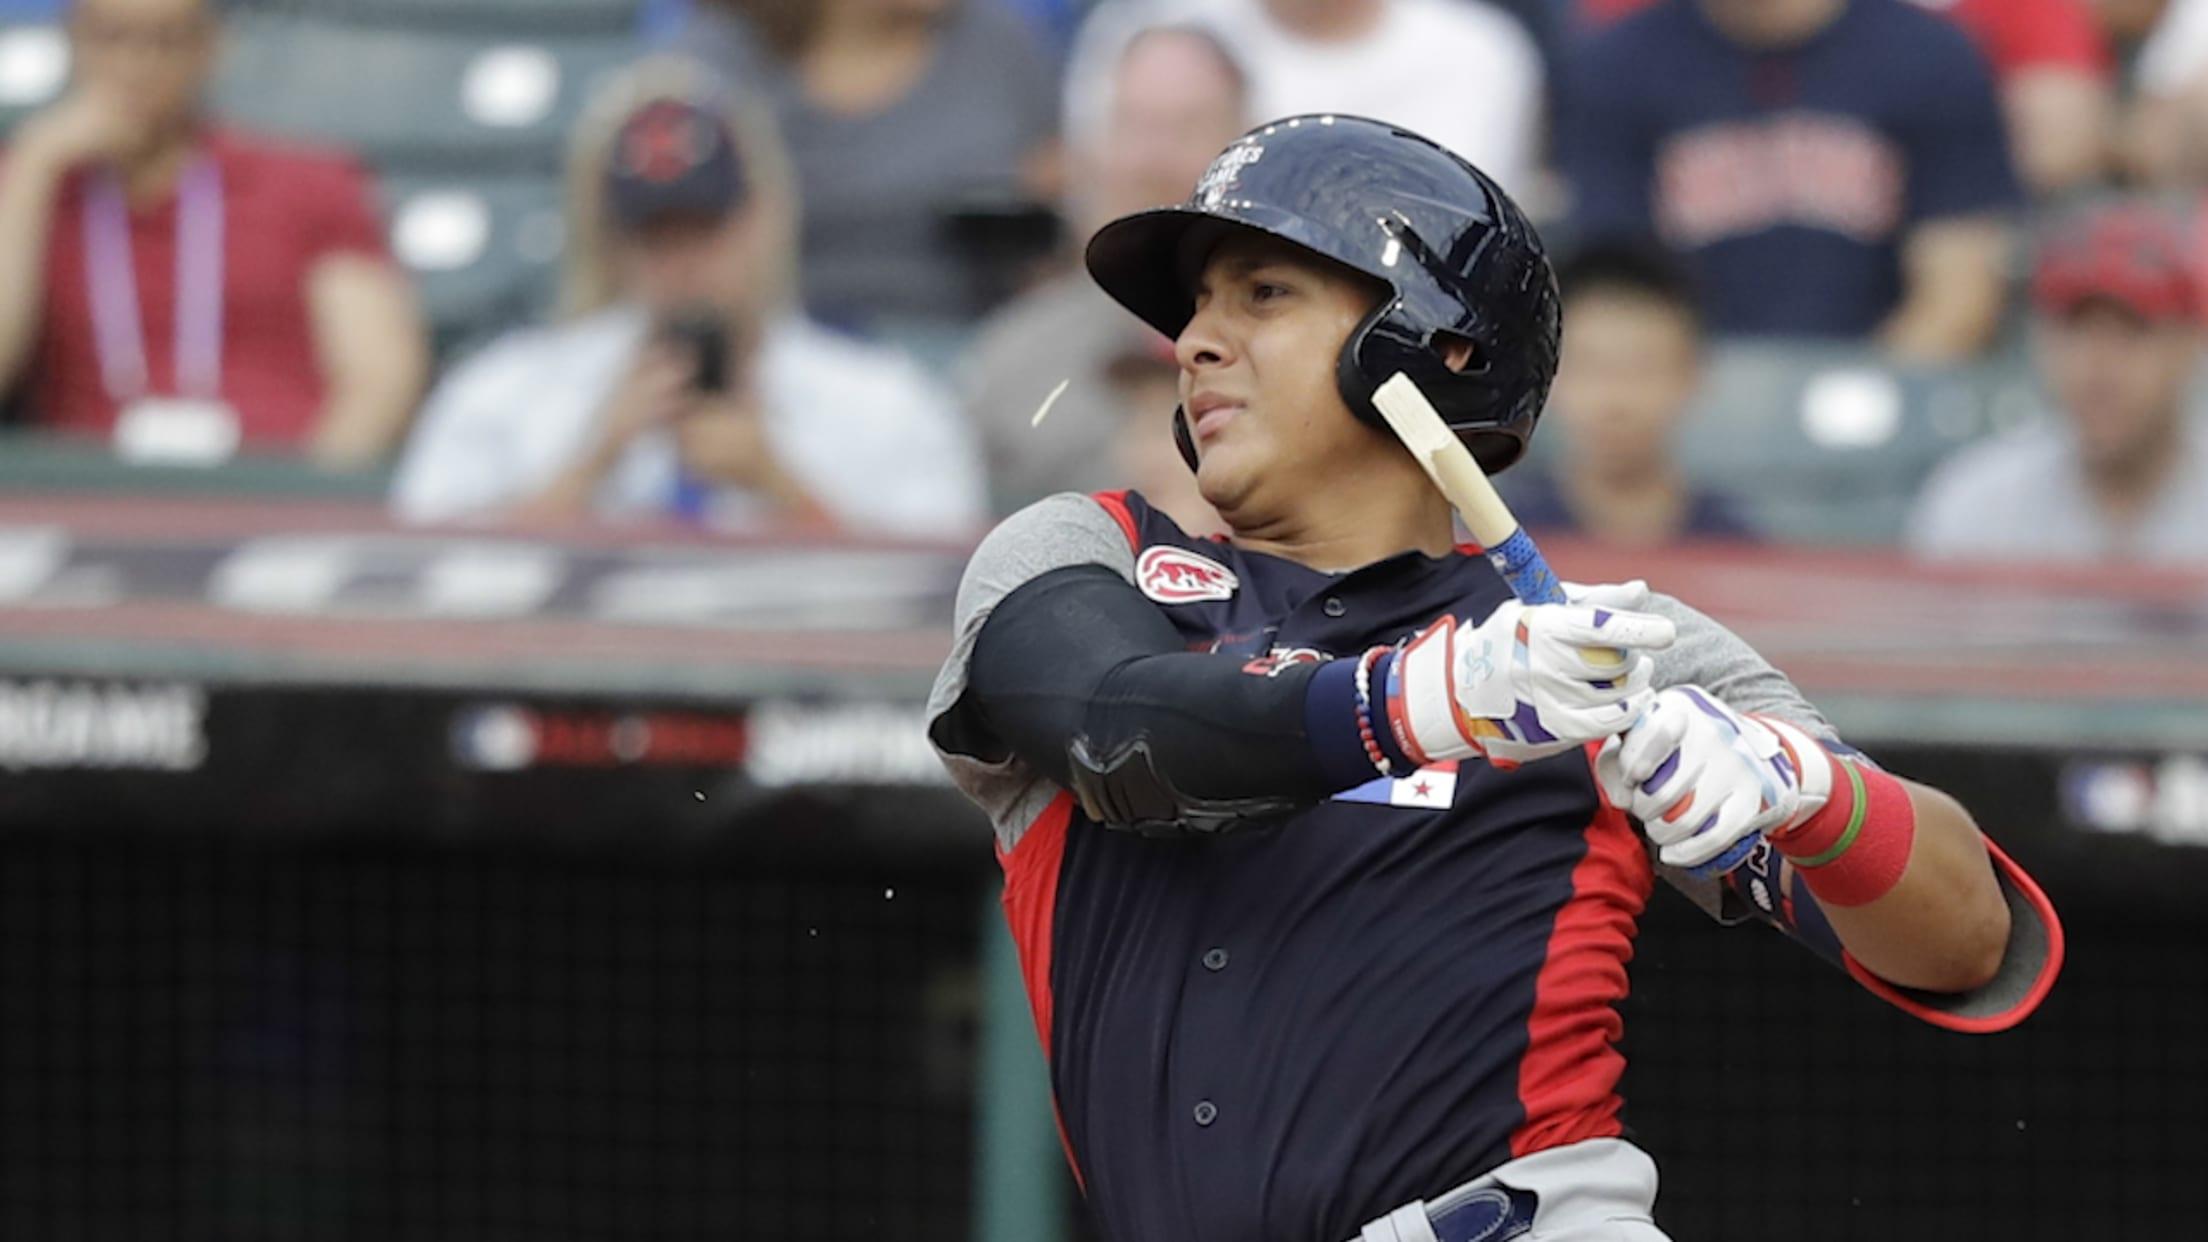 Top Prospects: Amaya, Cubs